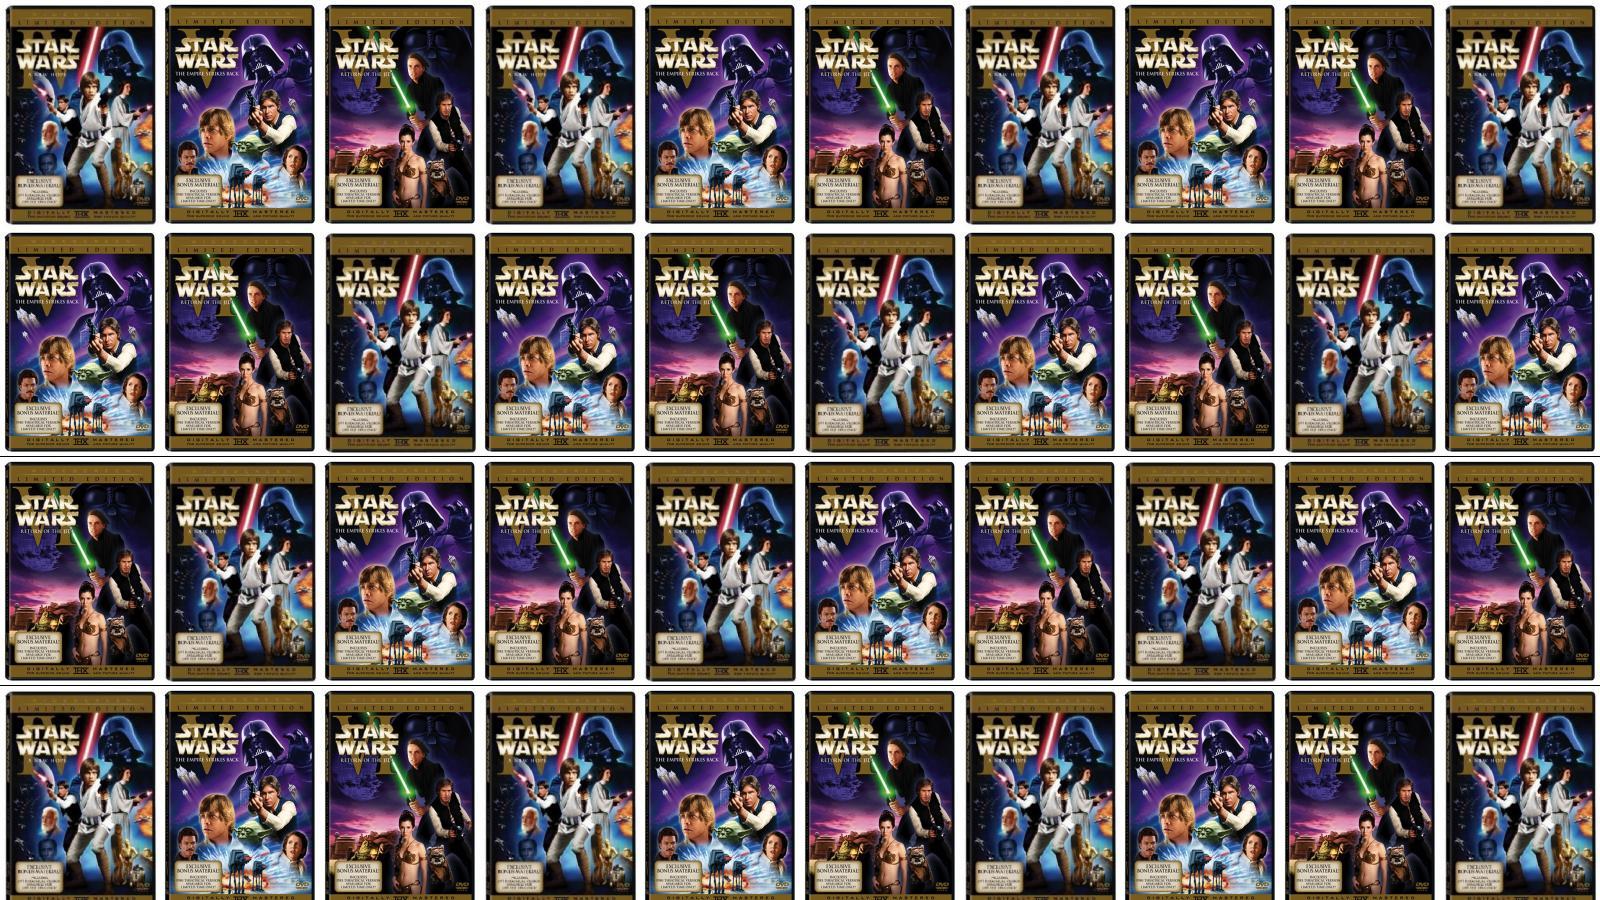 Return Of The Jedi Tiled Desktop Wallpaper